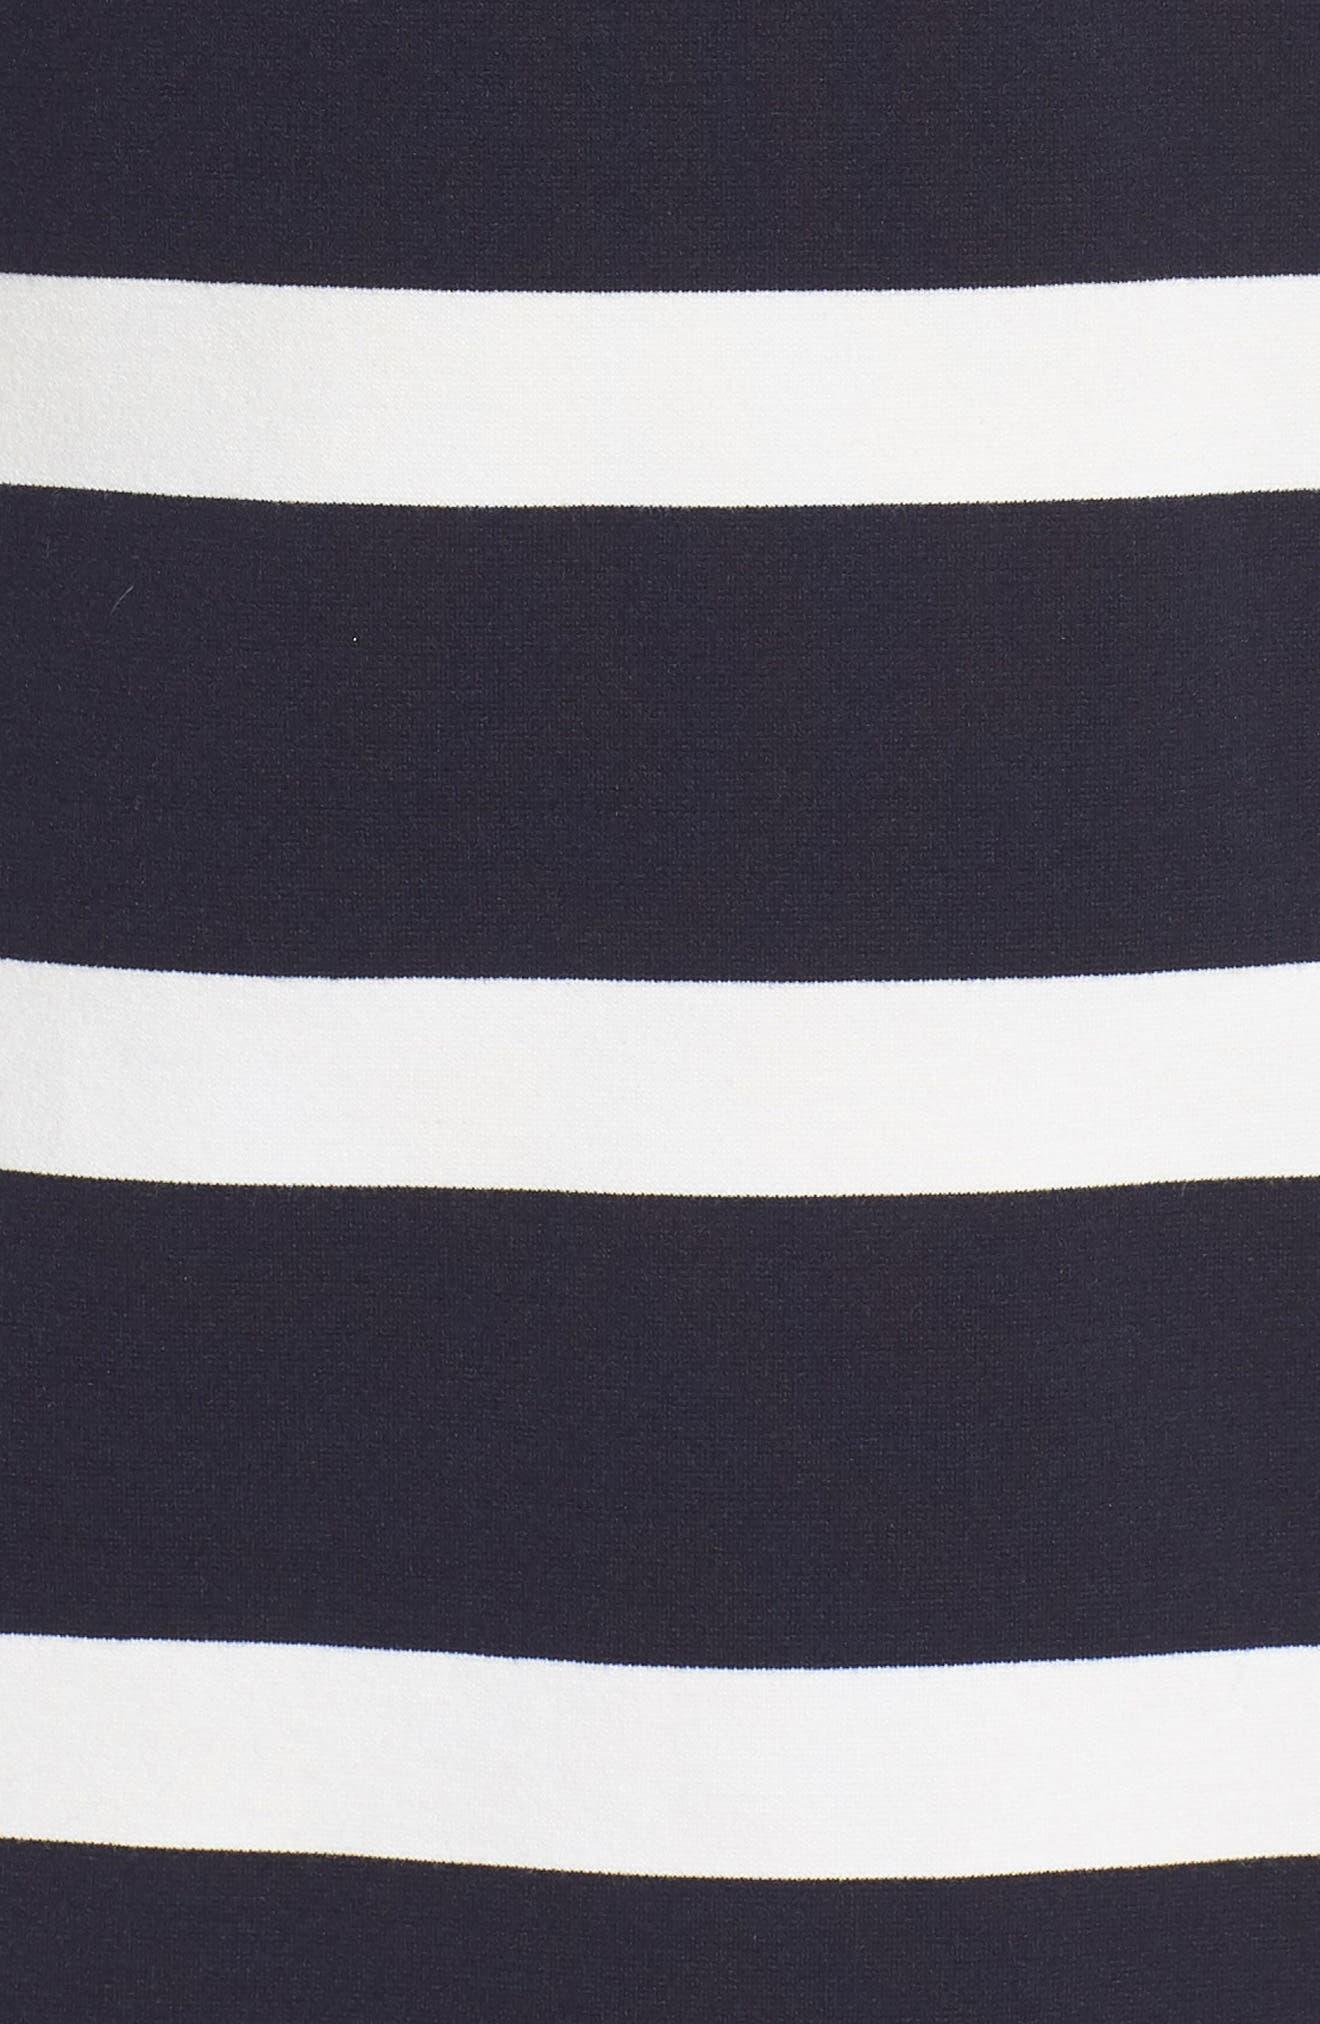 Stripe Balloon Sleeve Shift Dress,                             Alternate thumbnail 6, color,                             Navy/ Ivory